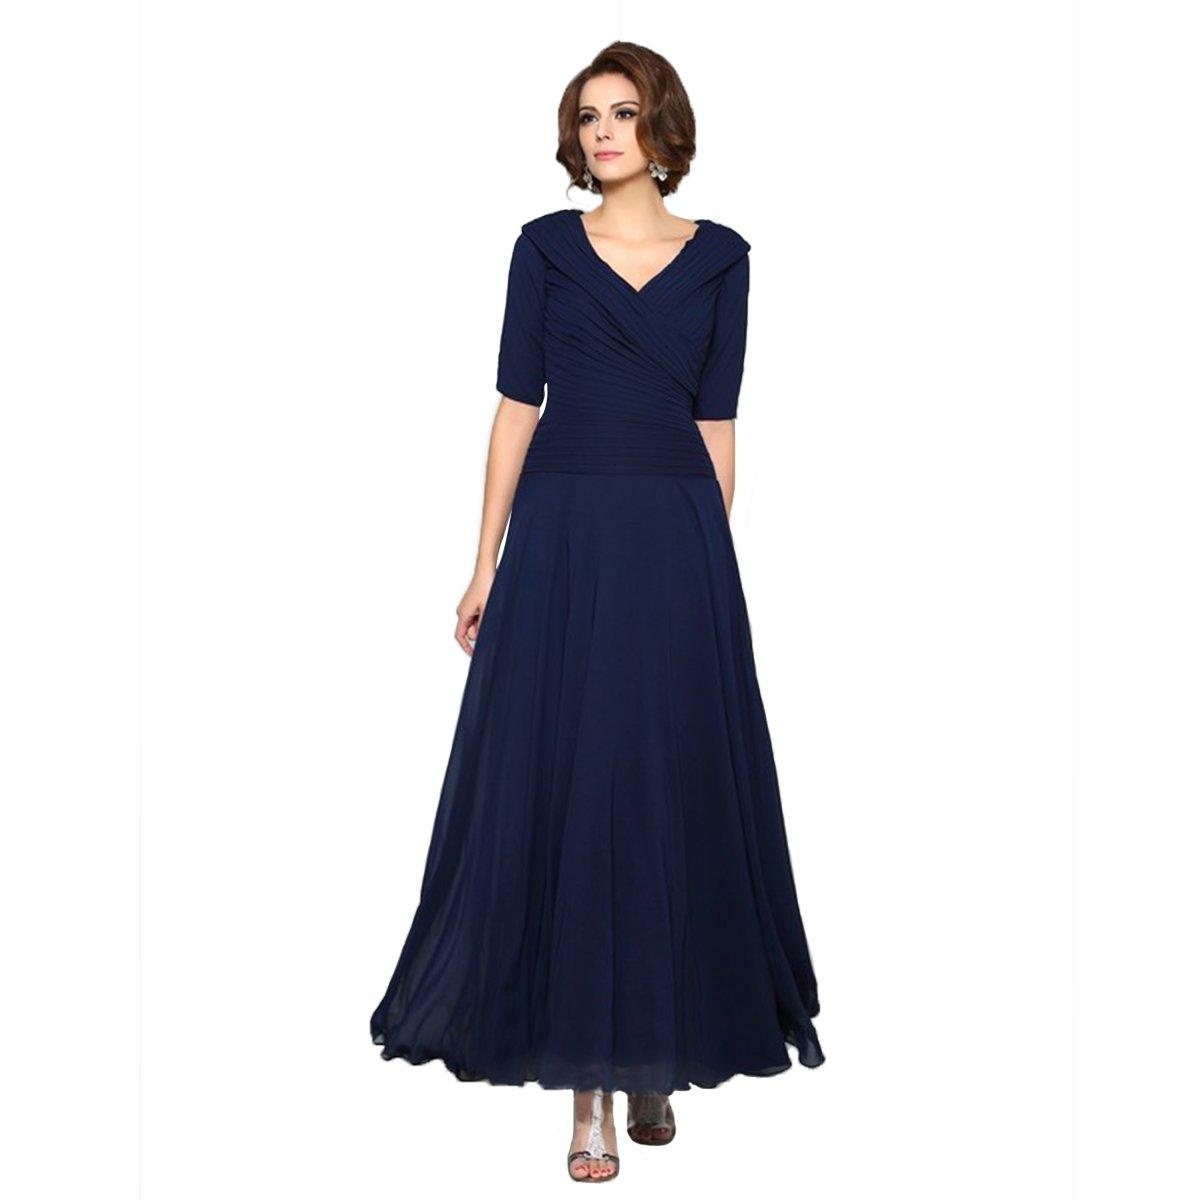 Landress A-Line V-Neck Chiffon Mother of The Bride Dresses Ankle Length(12,Dark Navy)